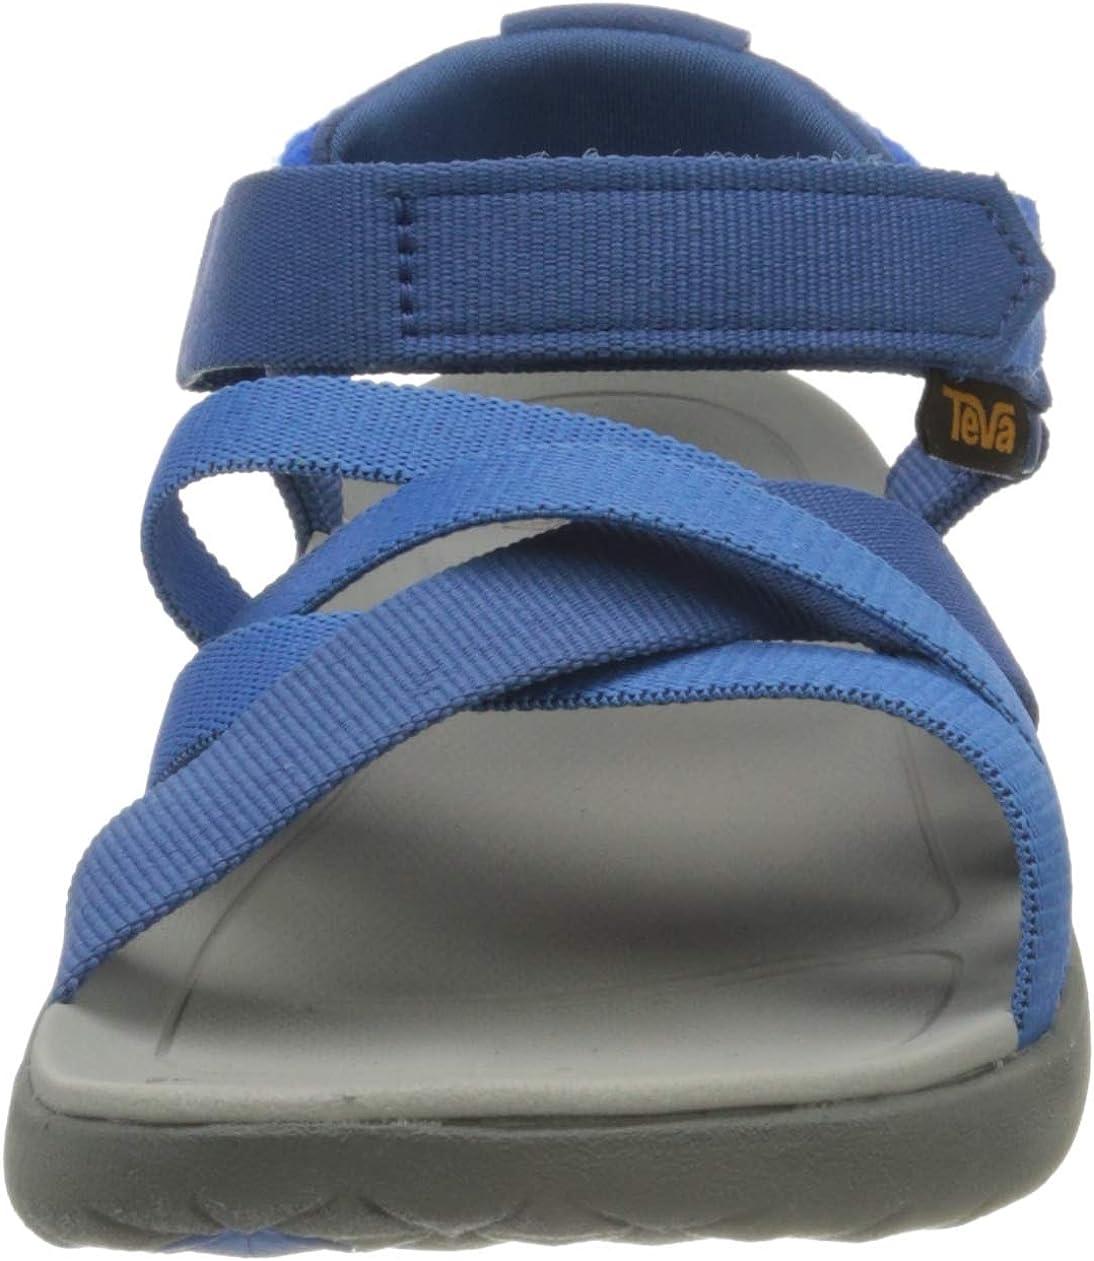 Action Sports (Teva DE) Sanborn Sandal Womens, Sandalias de Talón Abierto para Mujer Azul Dark Blue French Blue Dbfb